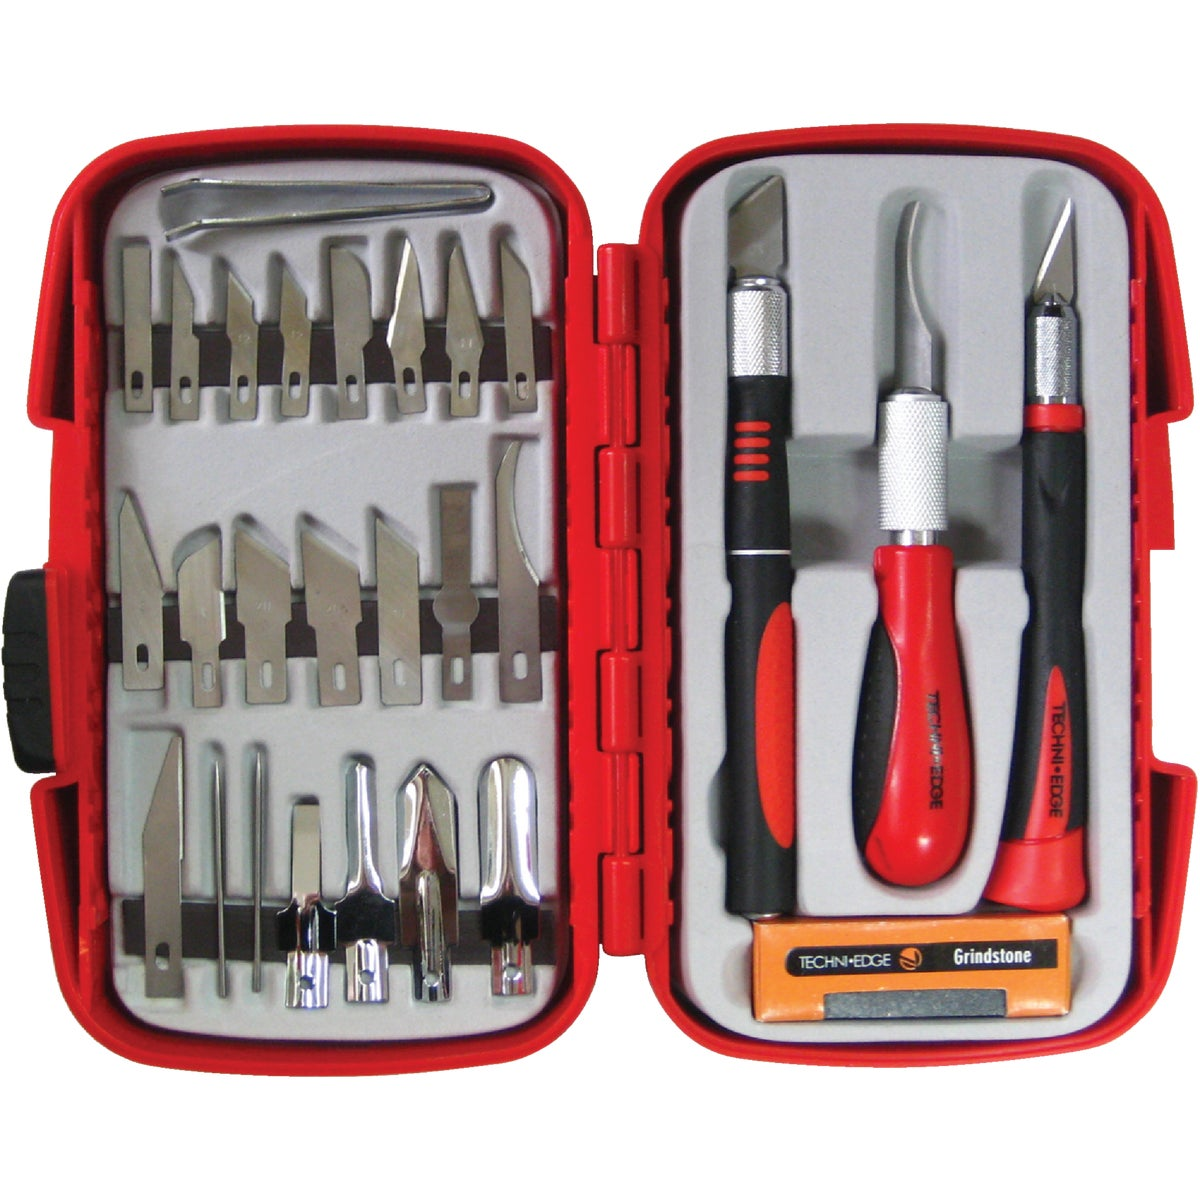 29PC HOBBY KNIFE SET - TE01-812 by Techni Edge Mfg Corp